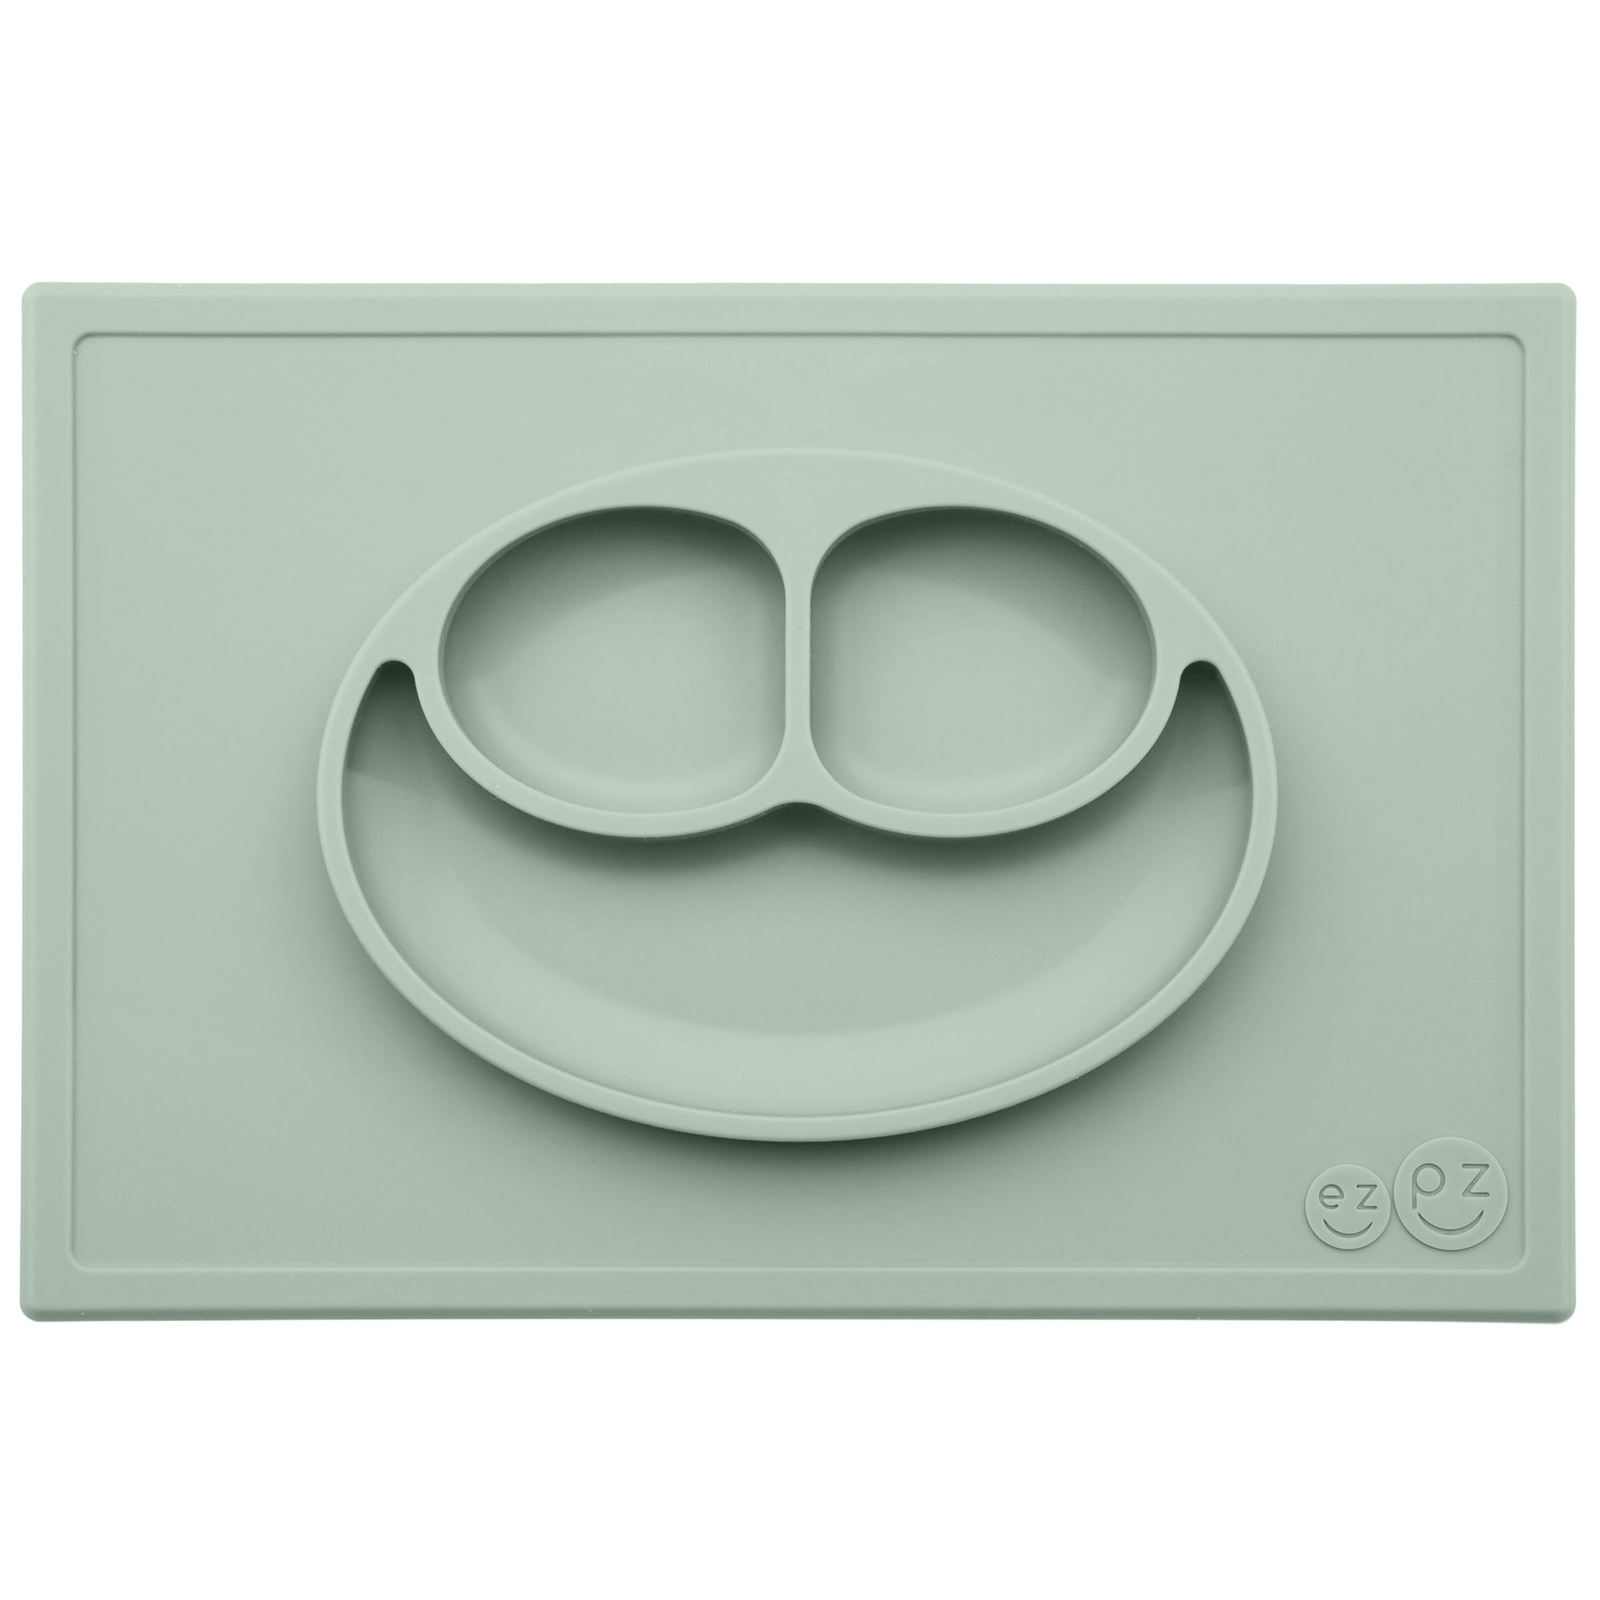 EZPZ Happy Mat - Sage image